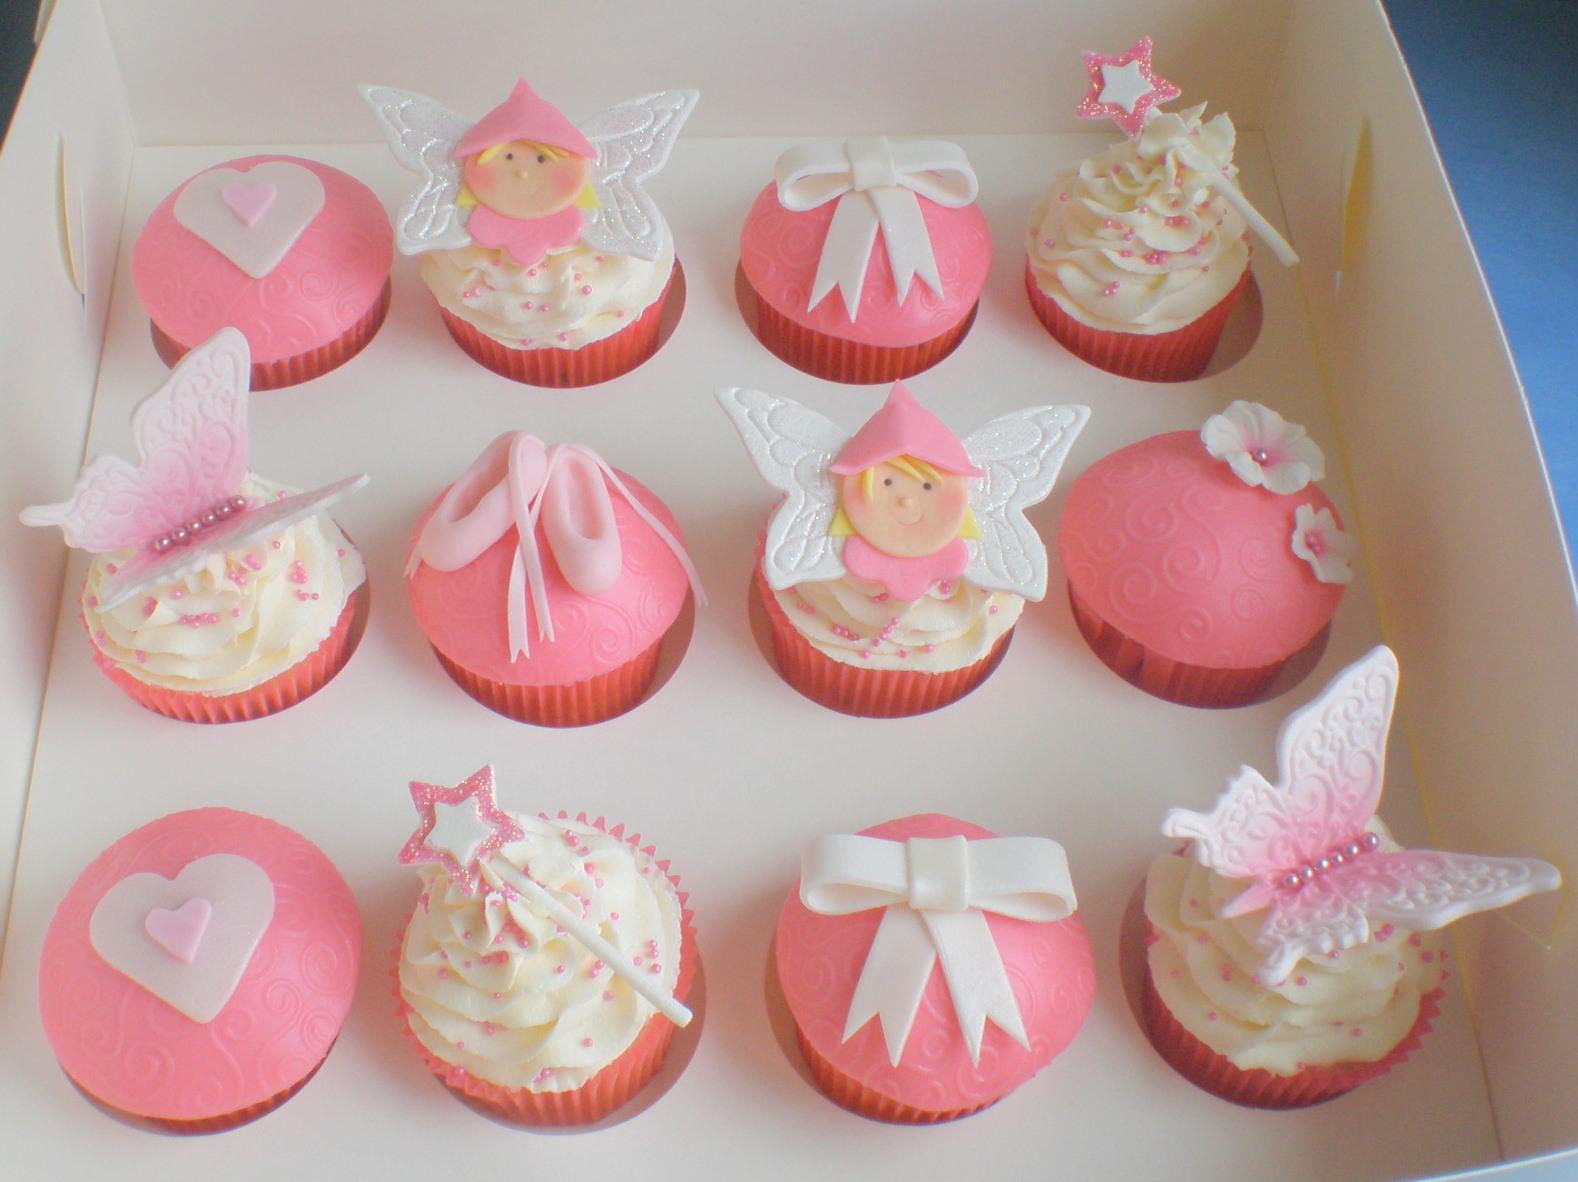 Cupcake Cakes Designs For Weddings